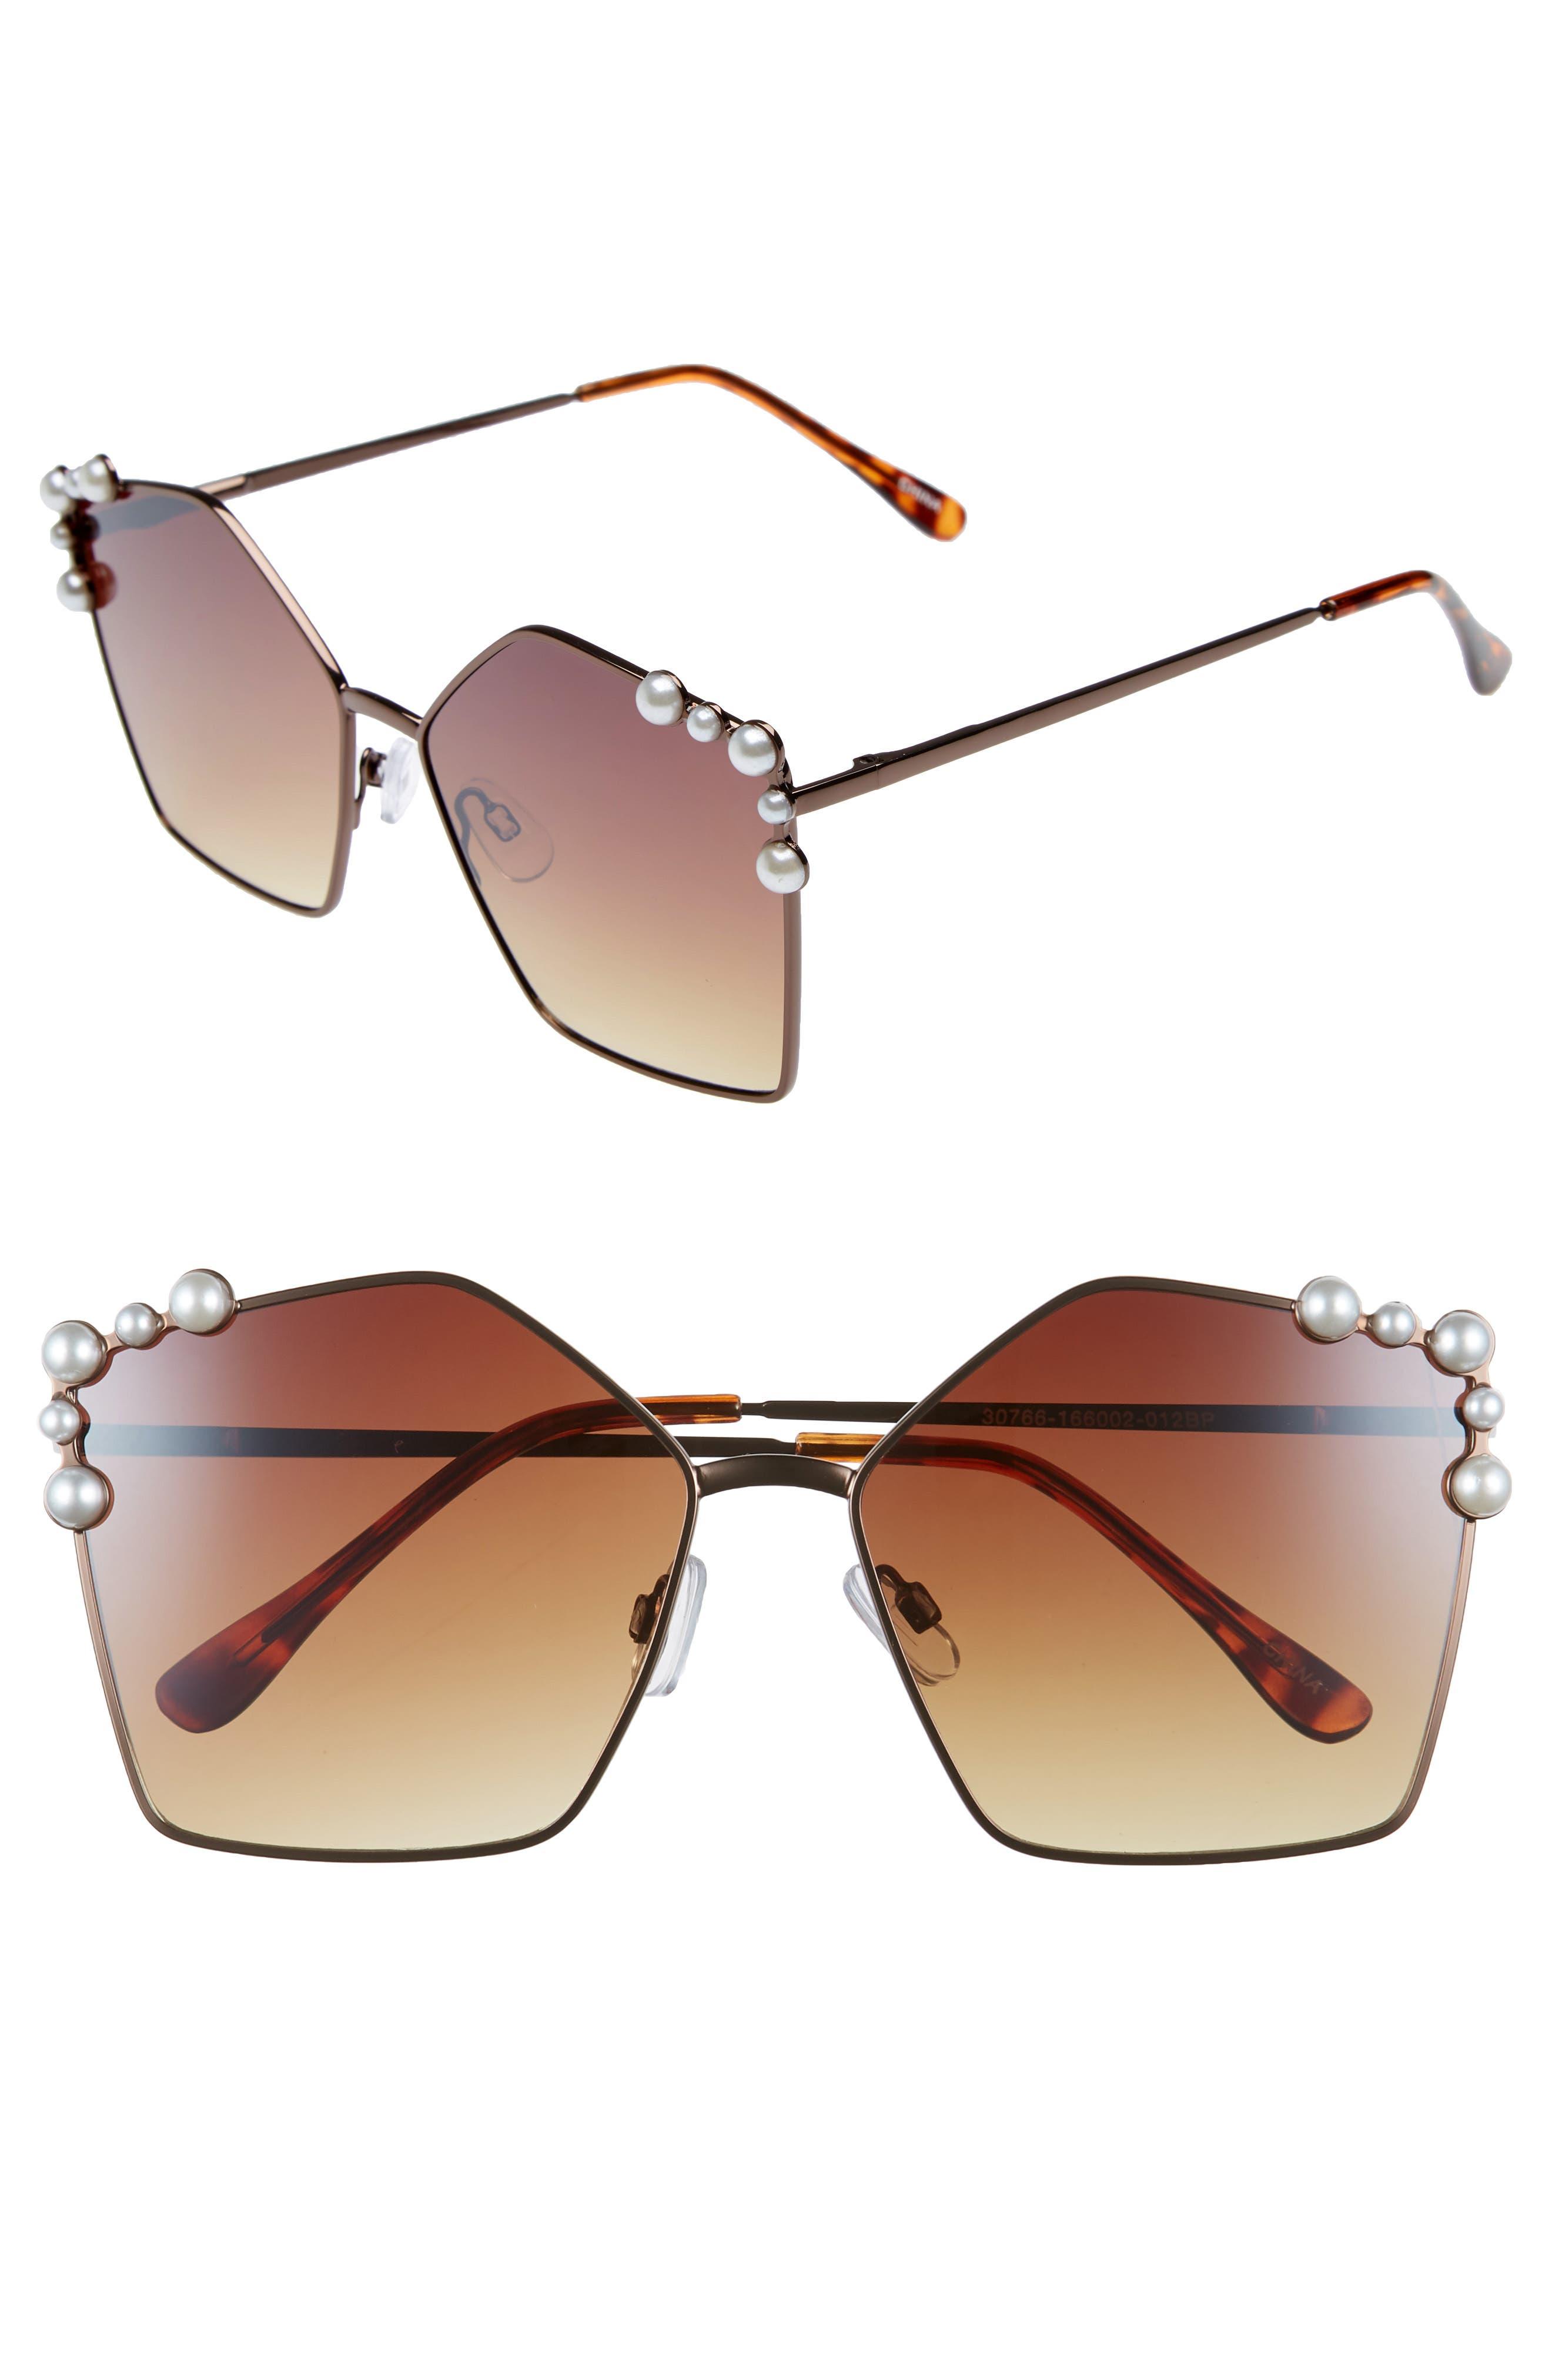 60mm Imitation Pearl Geometric Sunglasses,                             Main thumbnail 1, color,